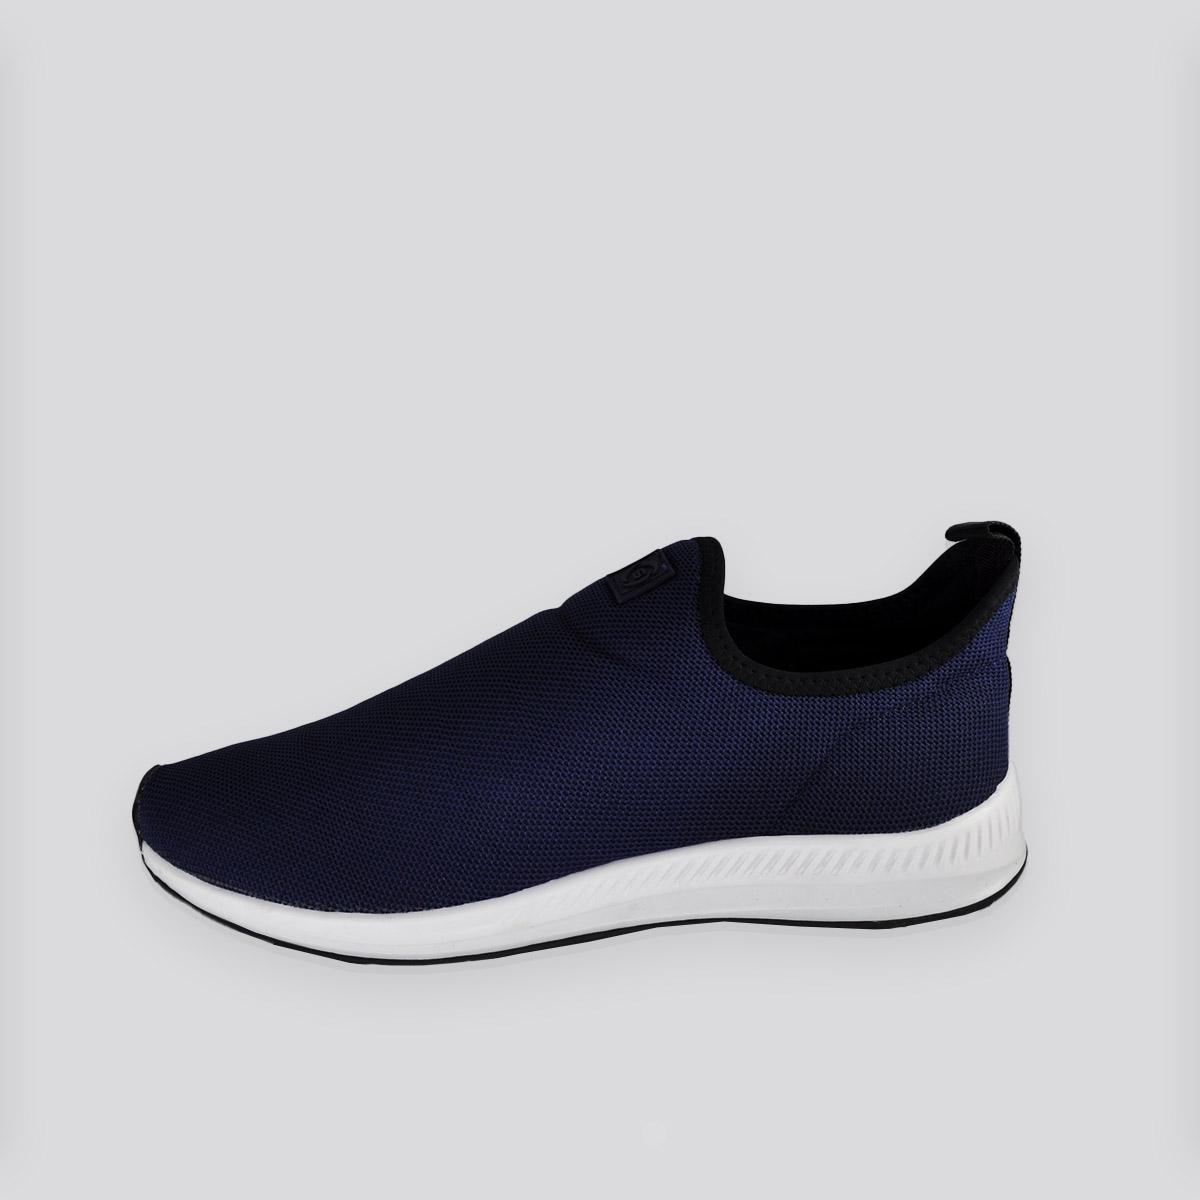 Tênis Masculino Kalpak Calce  Fácil Azul Marinho/Branco